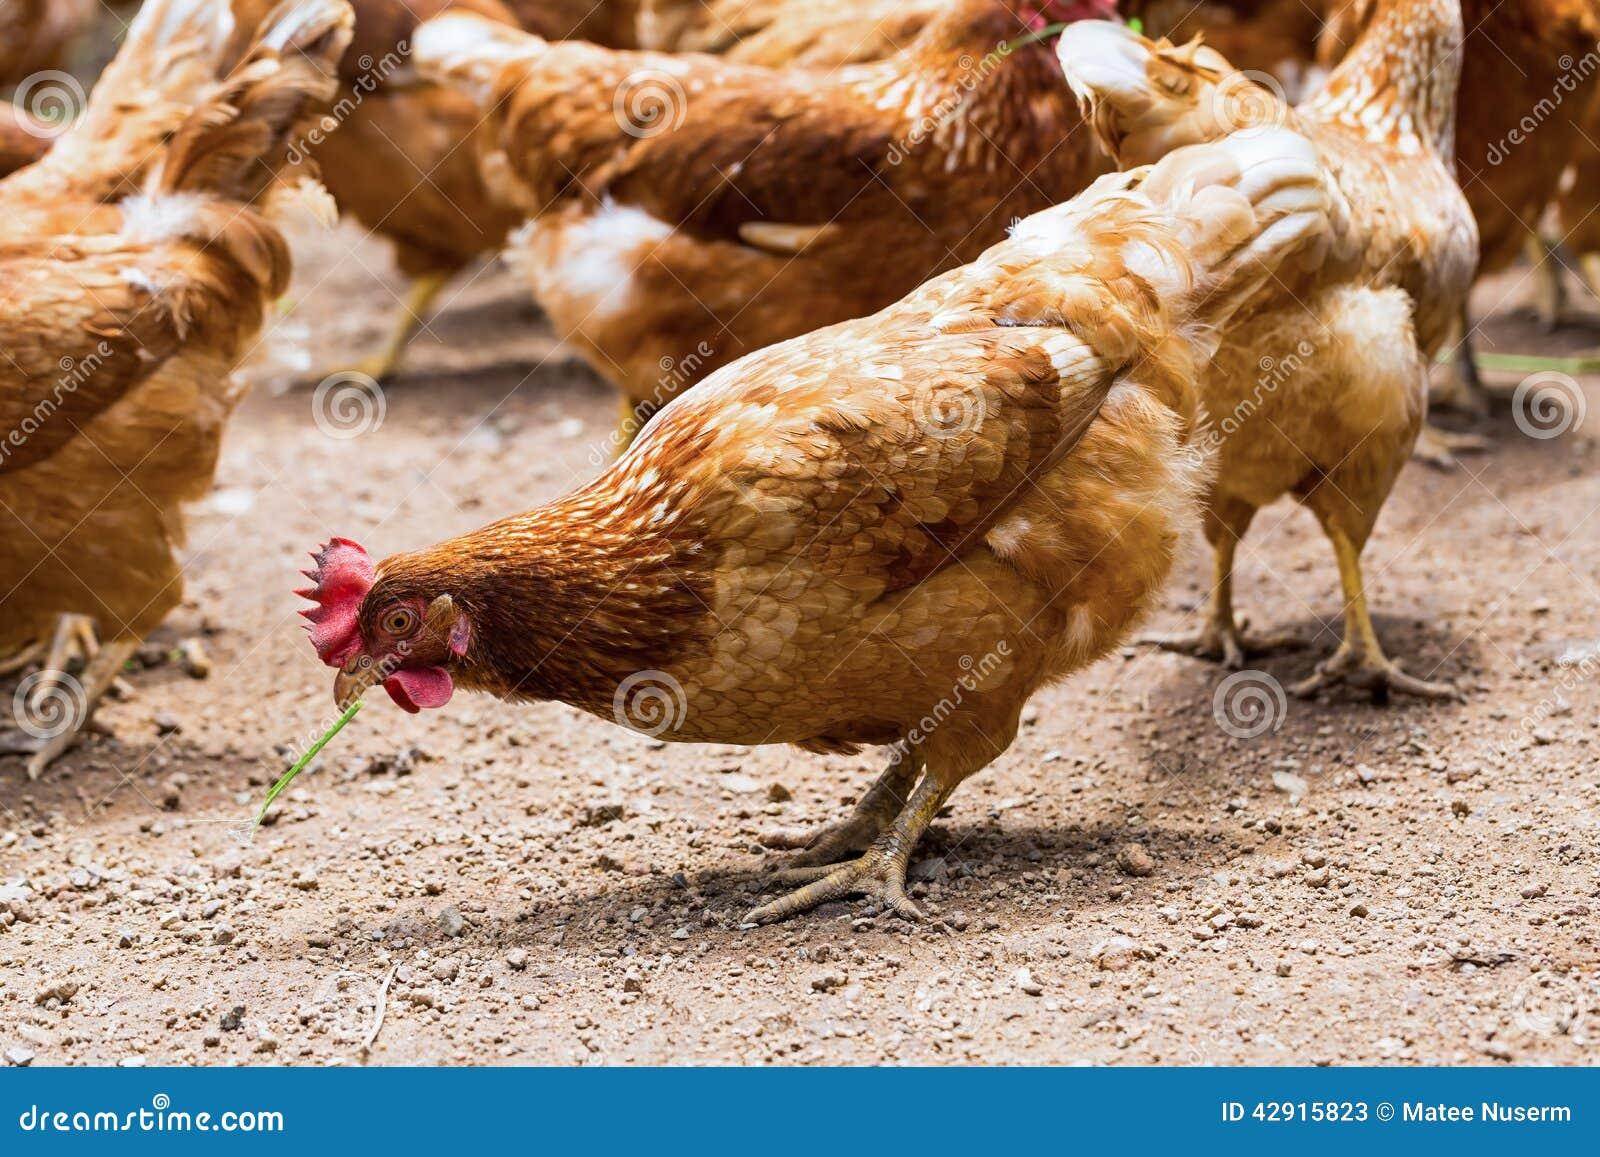 cage free hens happy hens